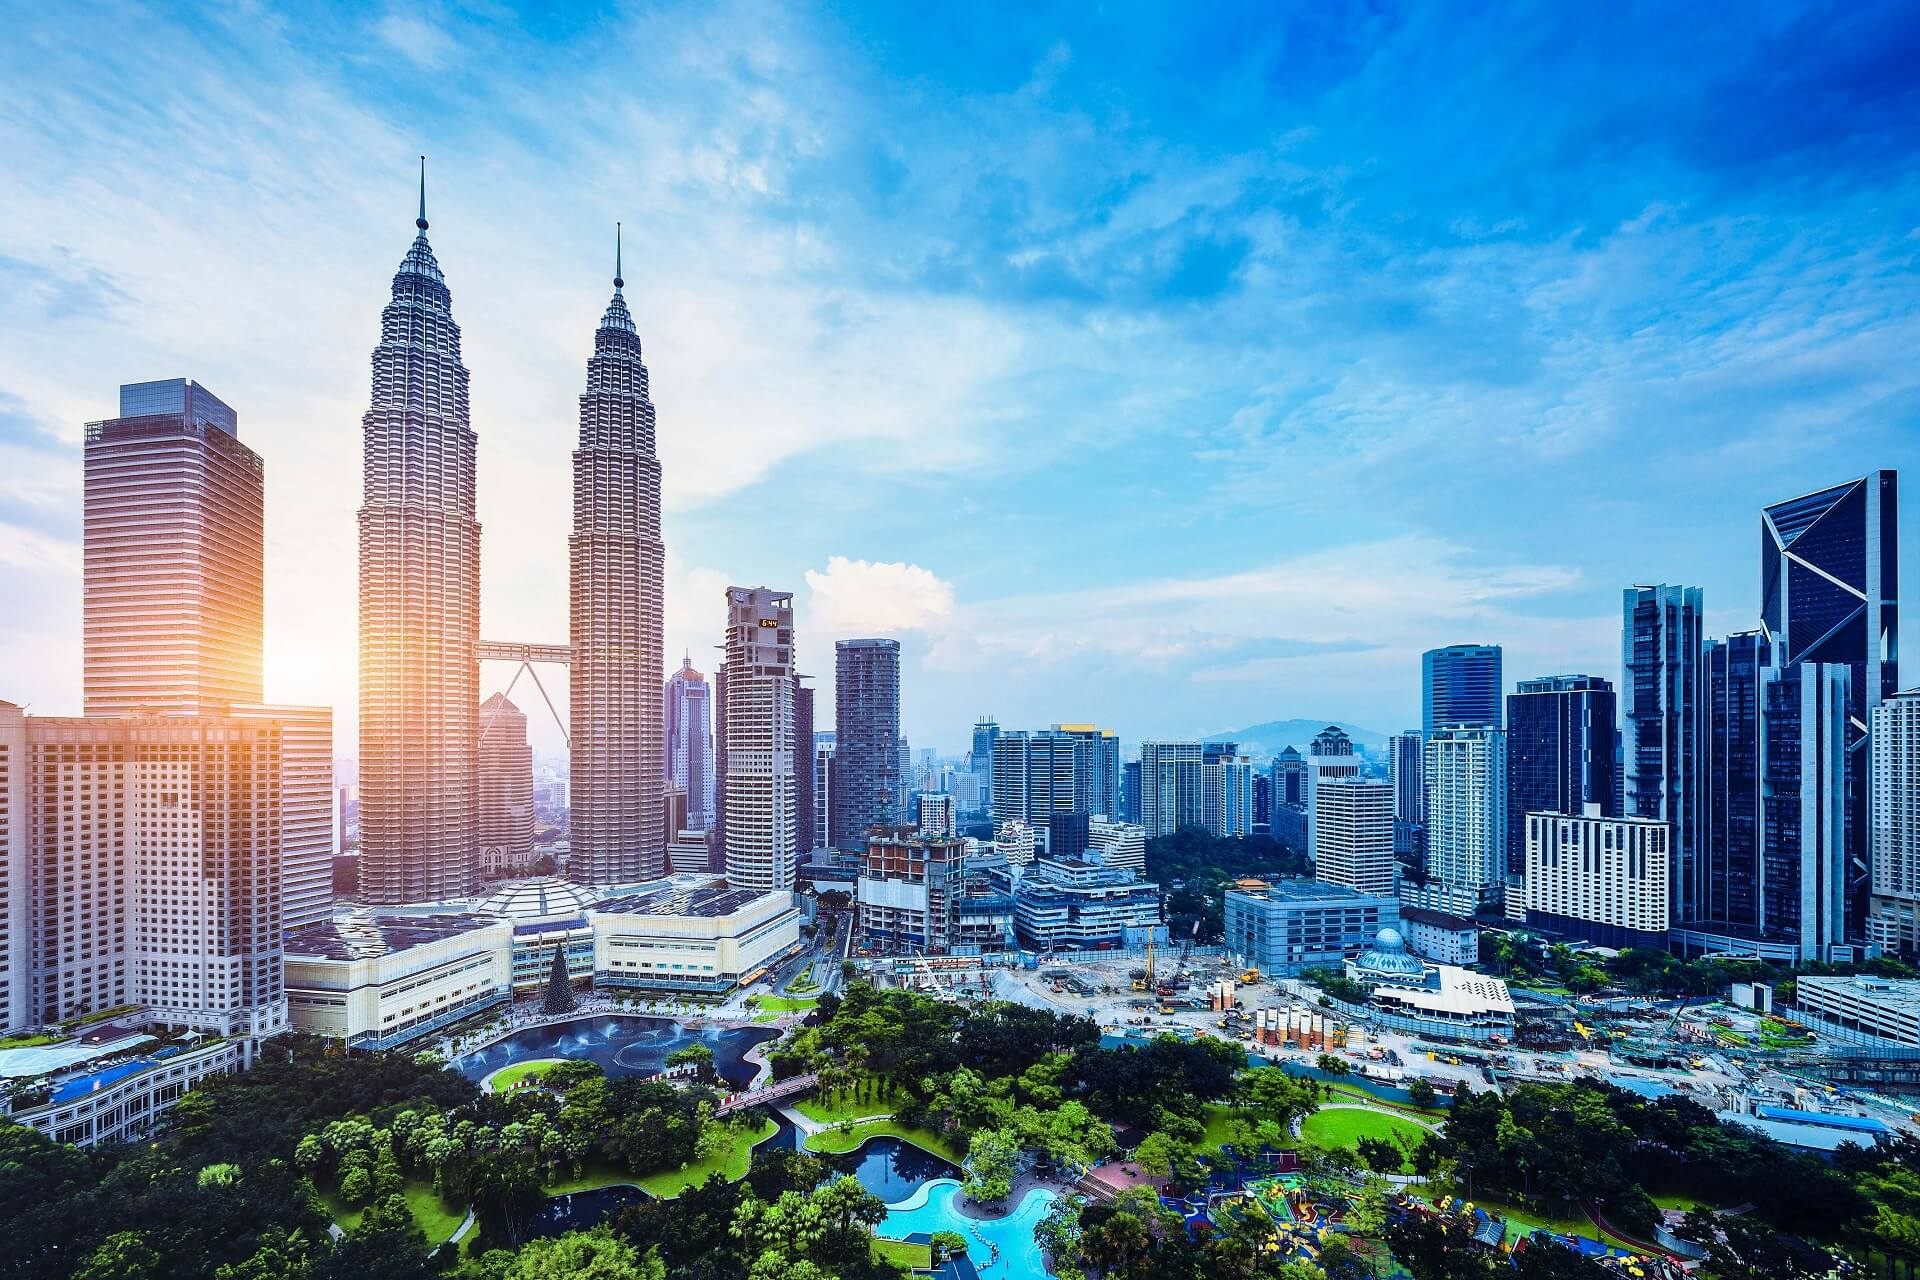 Die Zwillingstürme in Kuala Lumpur sind ein beliebtes Fotomotiv